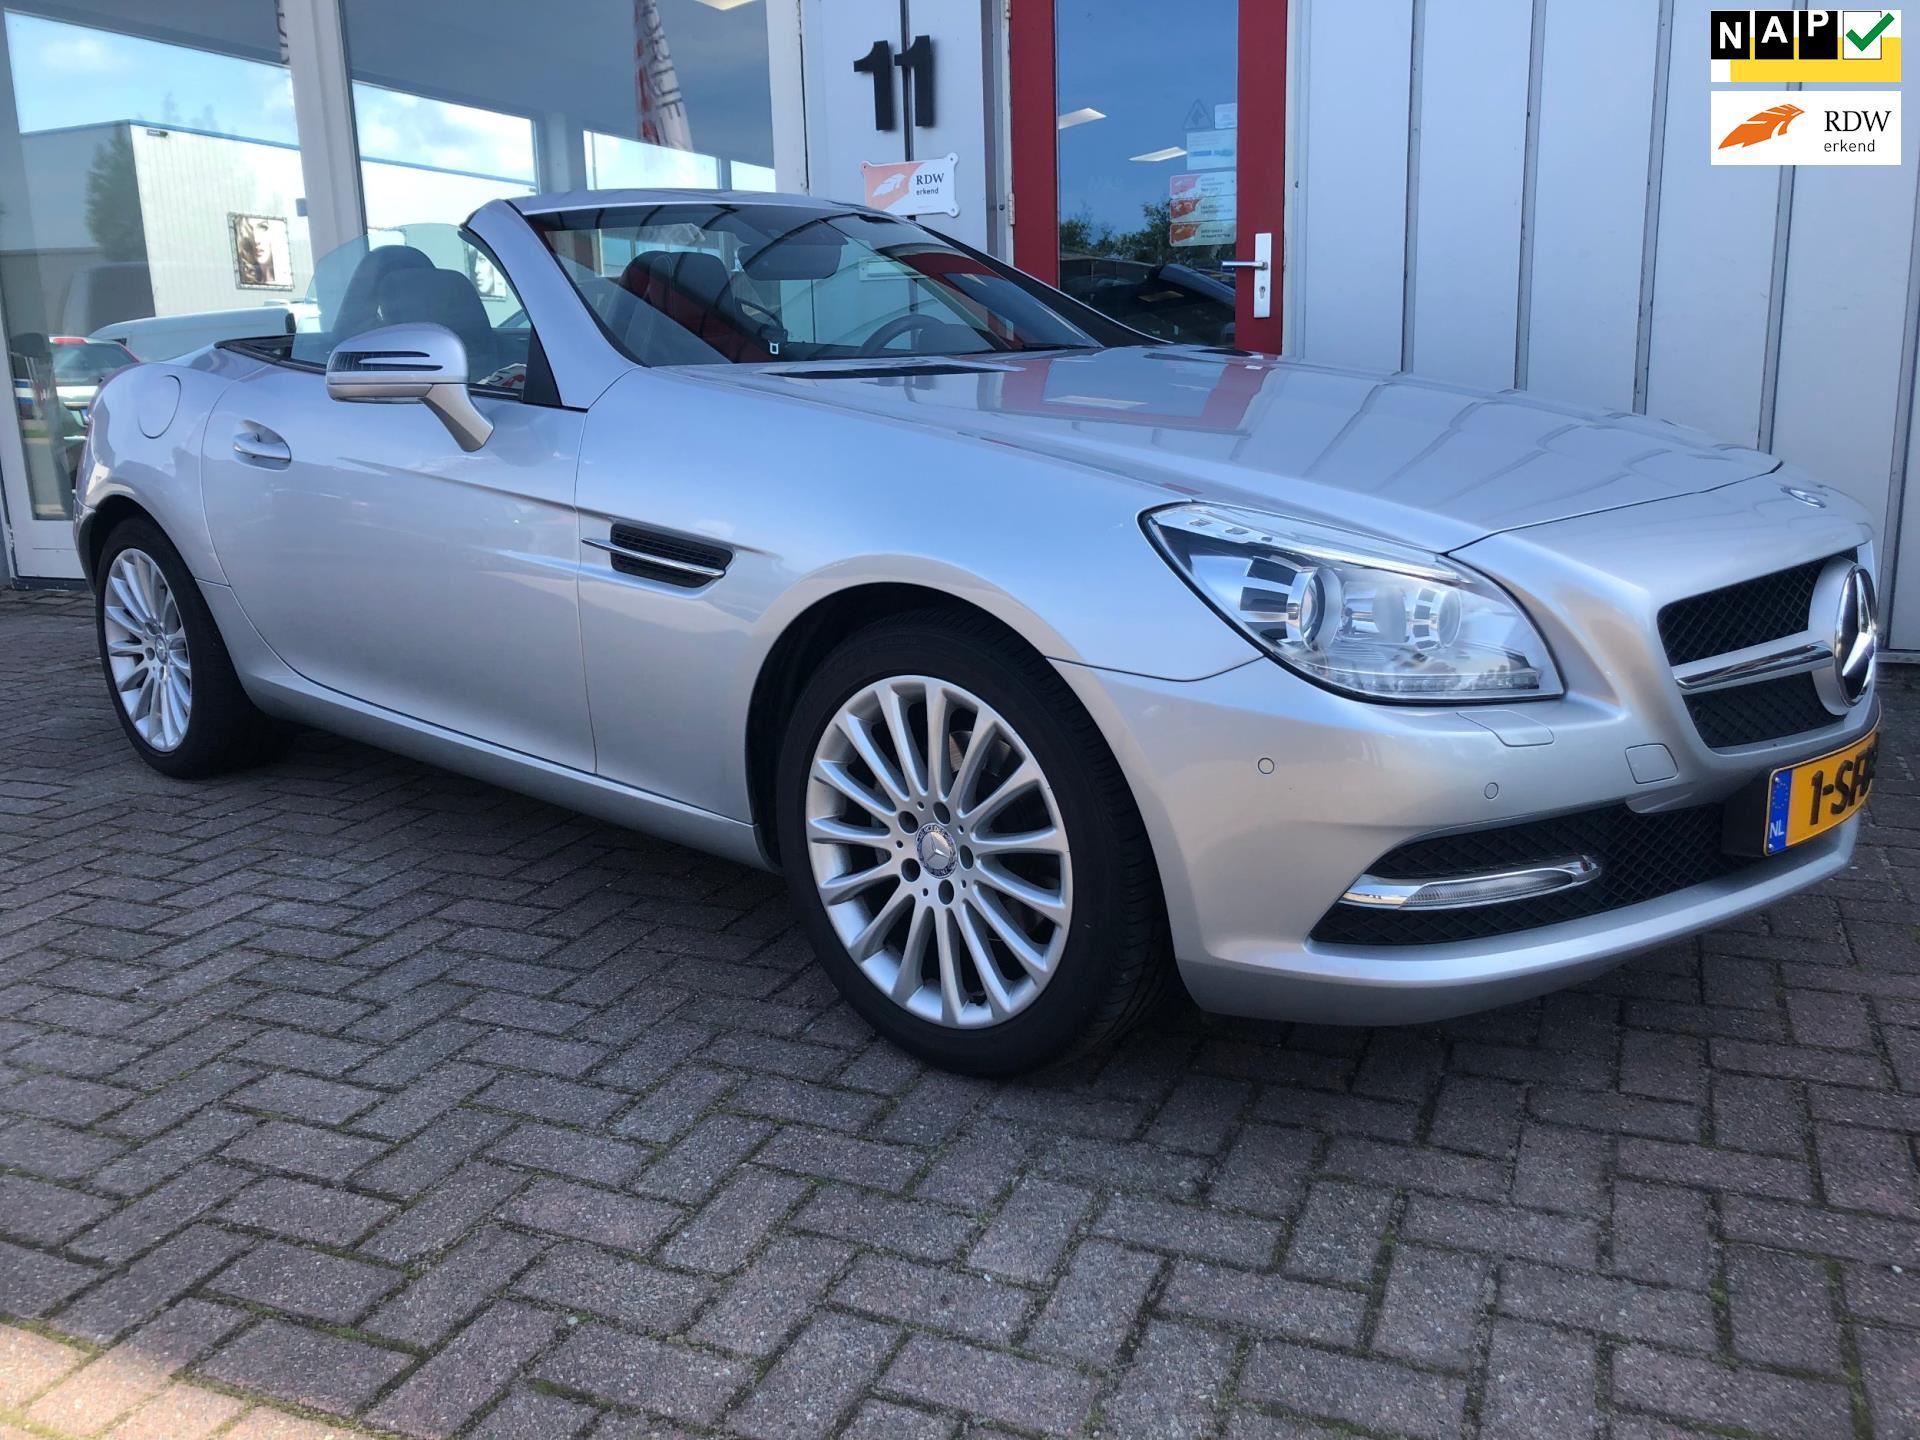 Mercedes-Benz SLK-klasse occasion - MKB Autobeheer